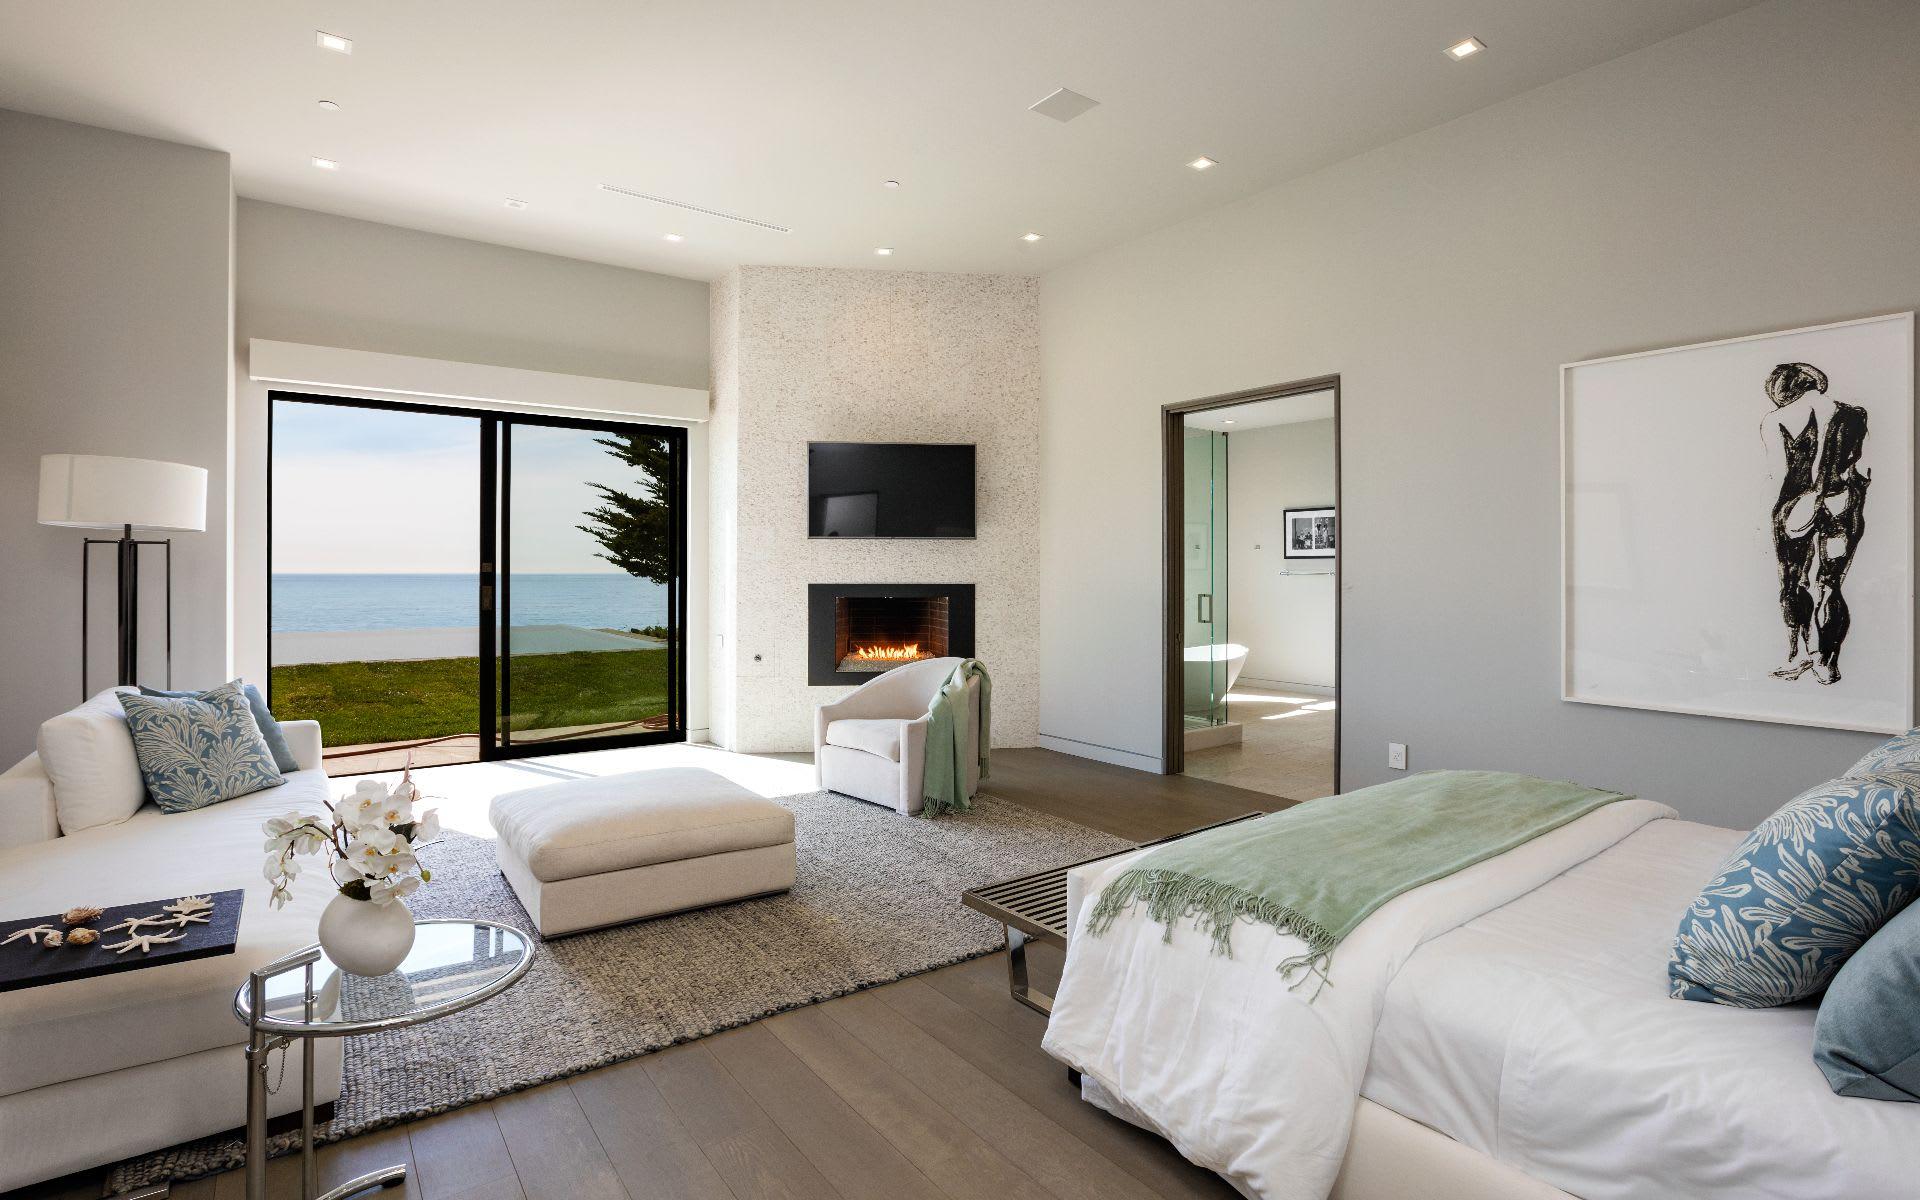 Additional photo for property listing at 11902 Ellice St 11902 Ellice St Malibu, California,90265 United States